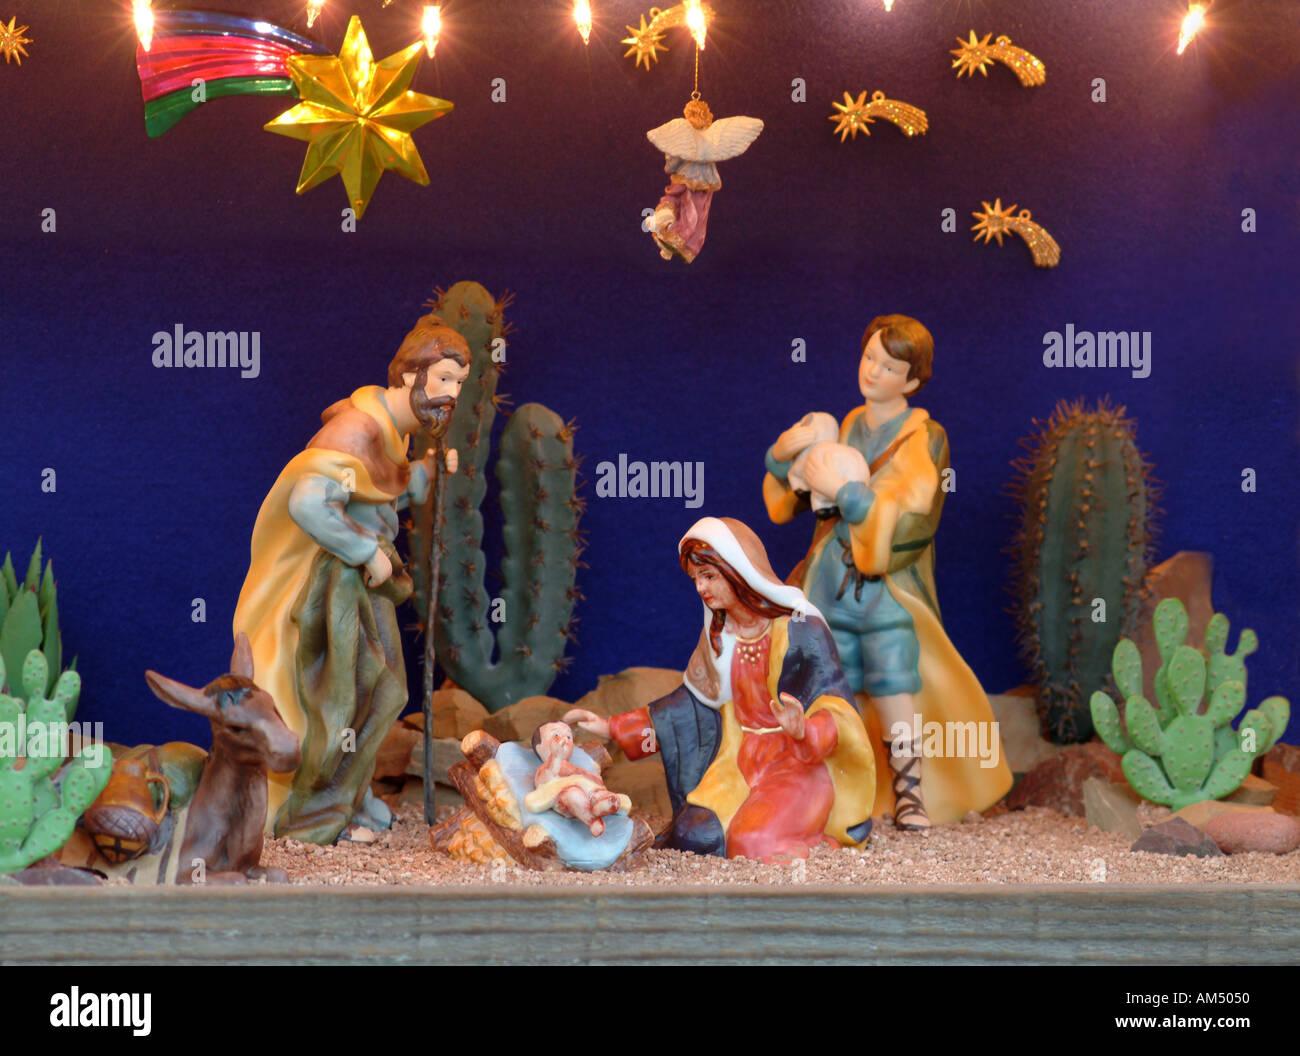 a christmas nativity scene stock image - Christmas Nativity Scenes